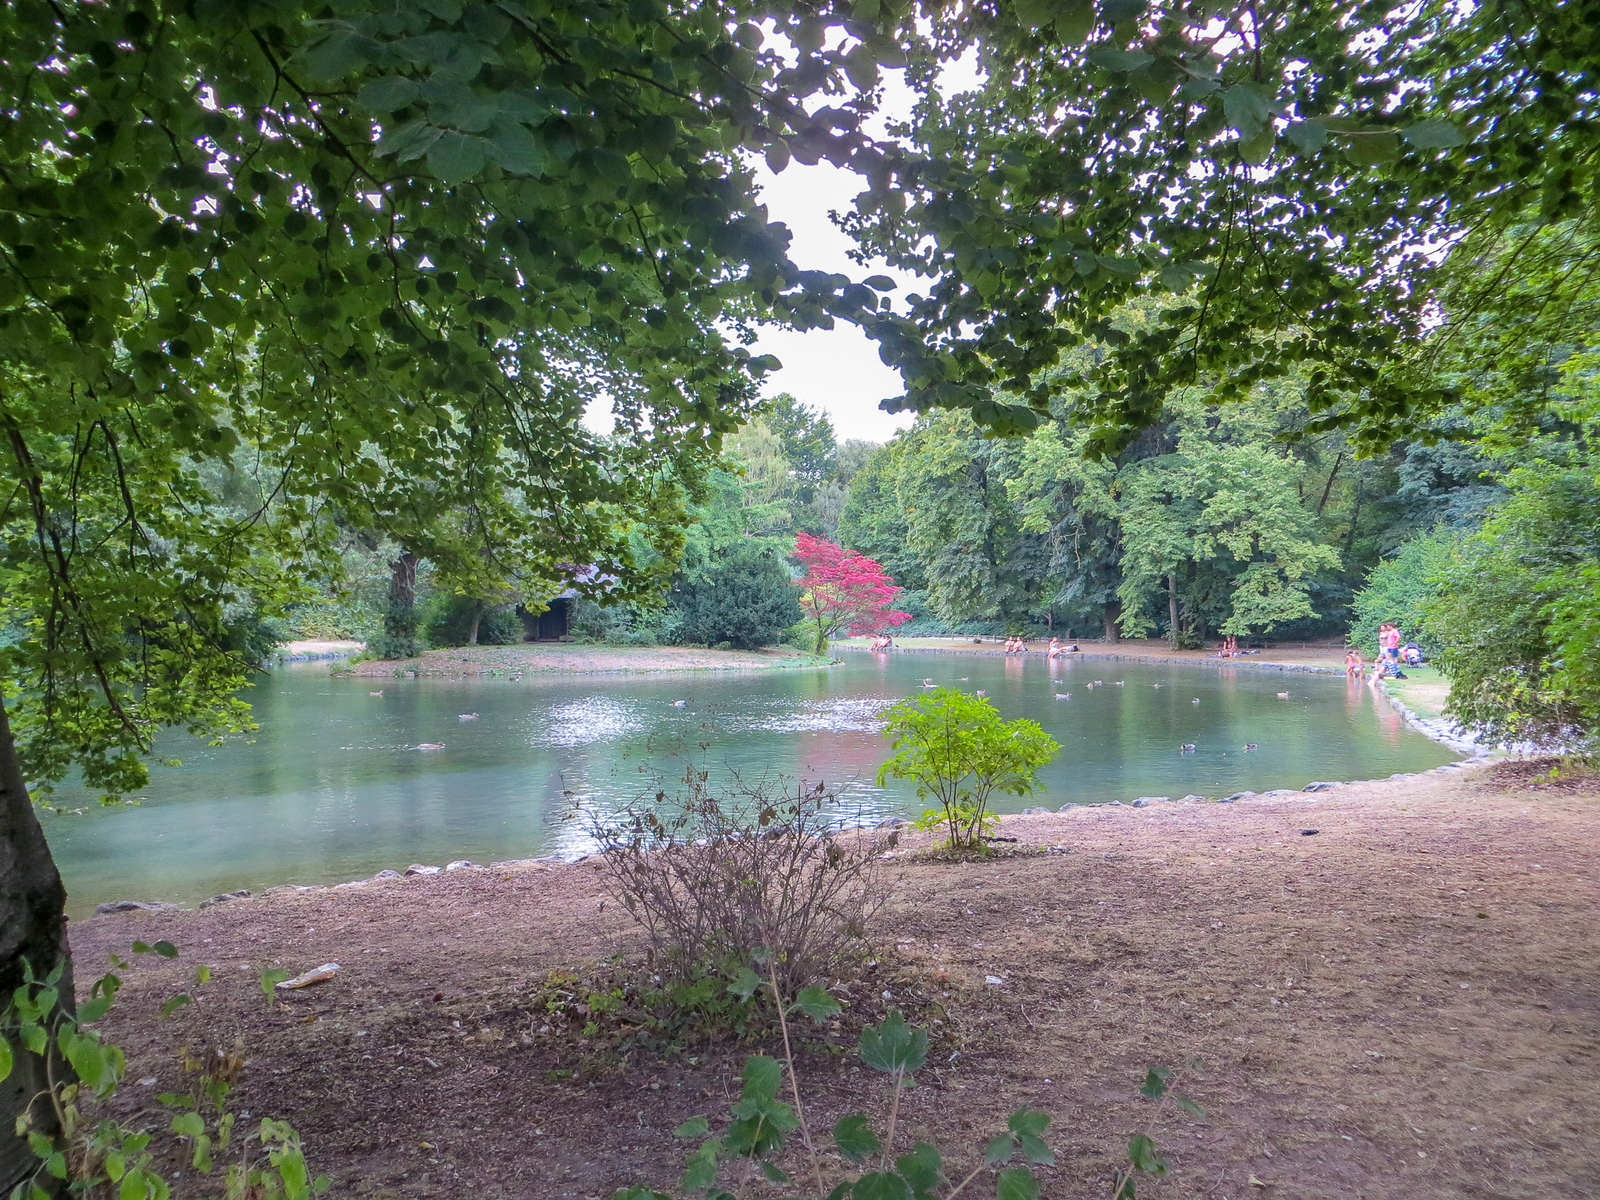 munich 2 days itinerary: don't skip the english garden